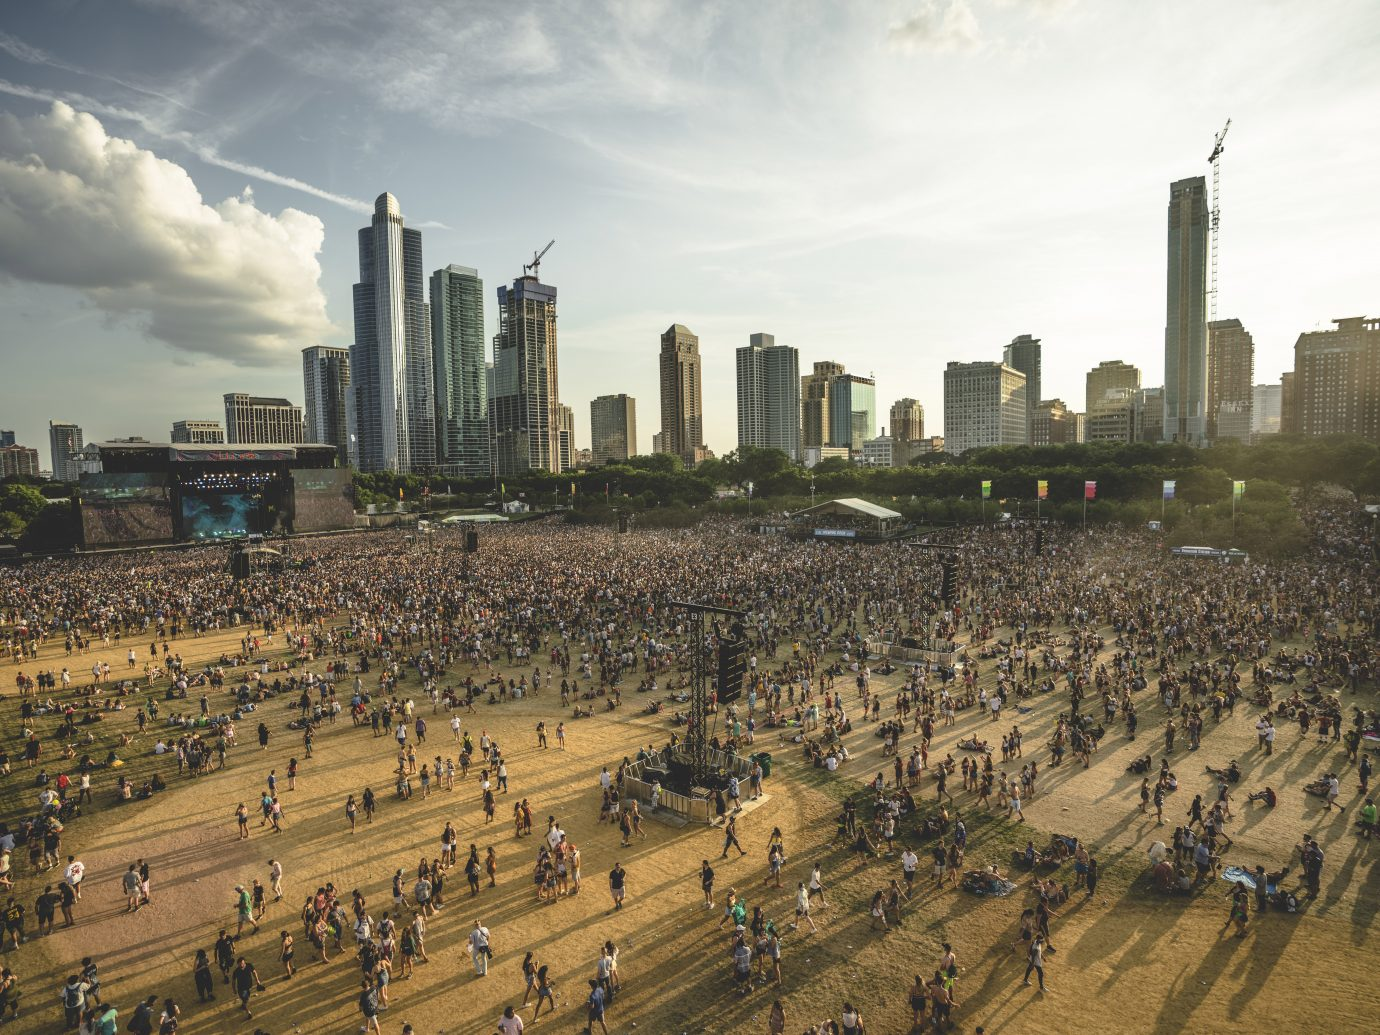 aerial shot of people walking on grass